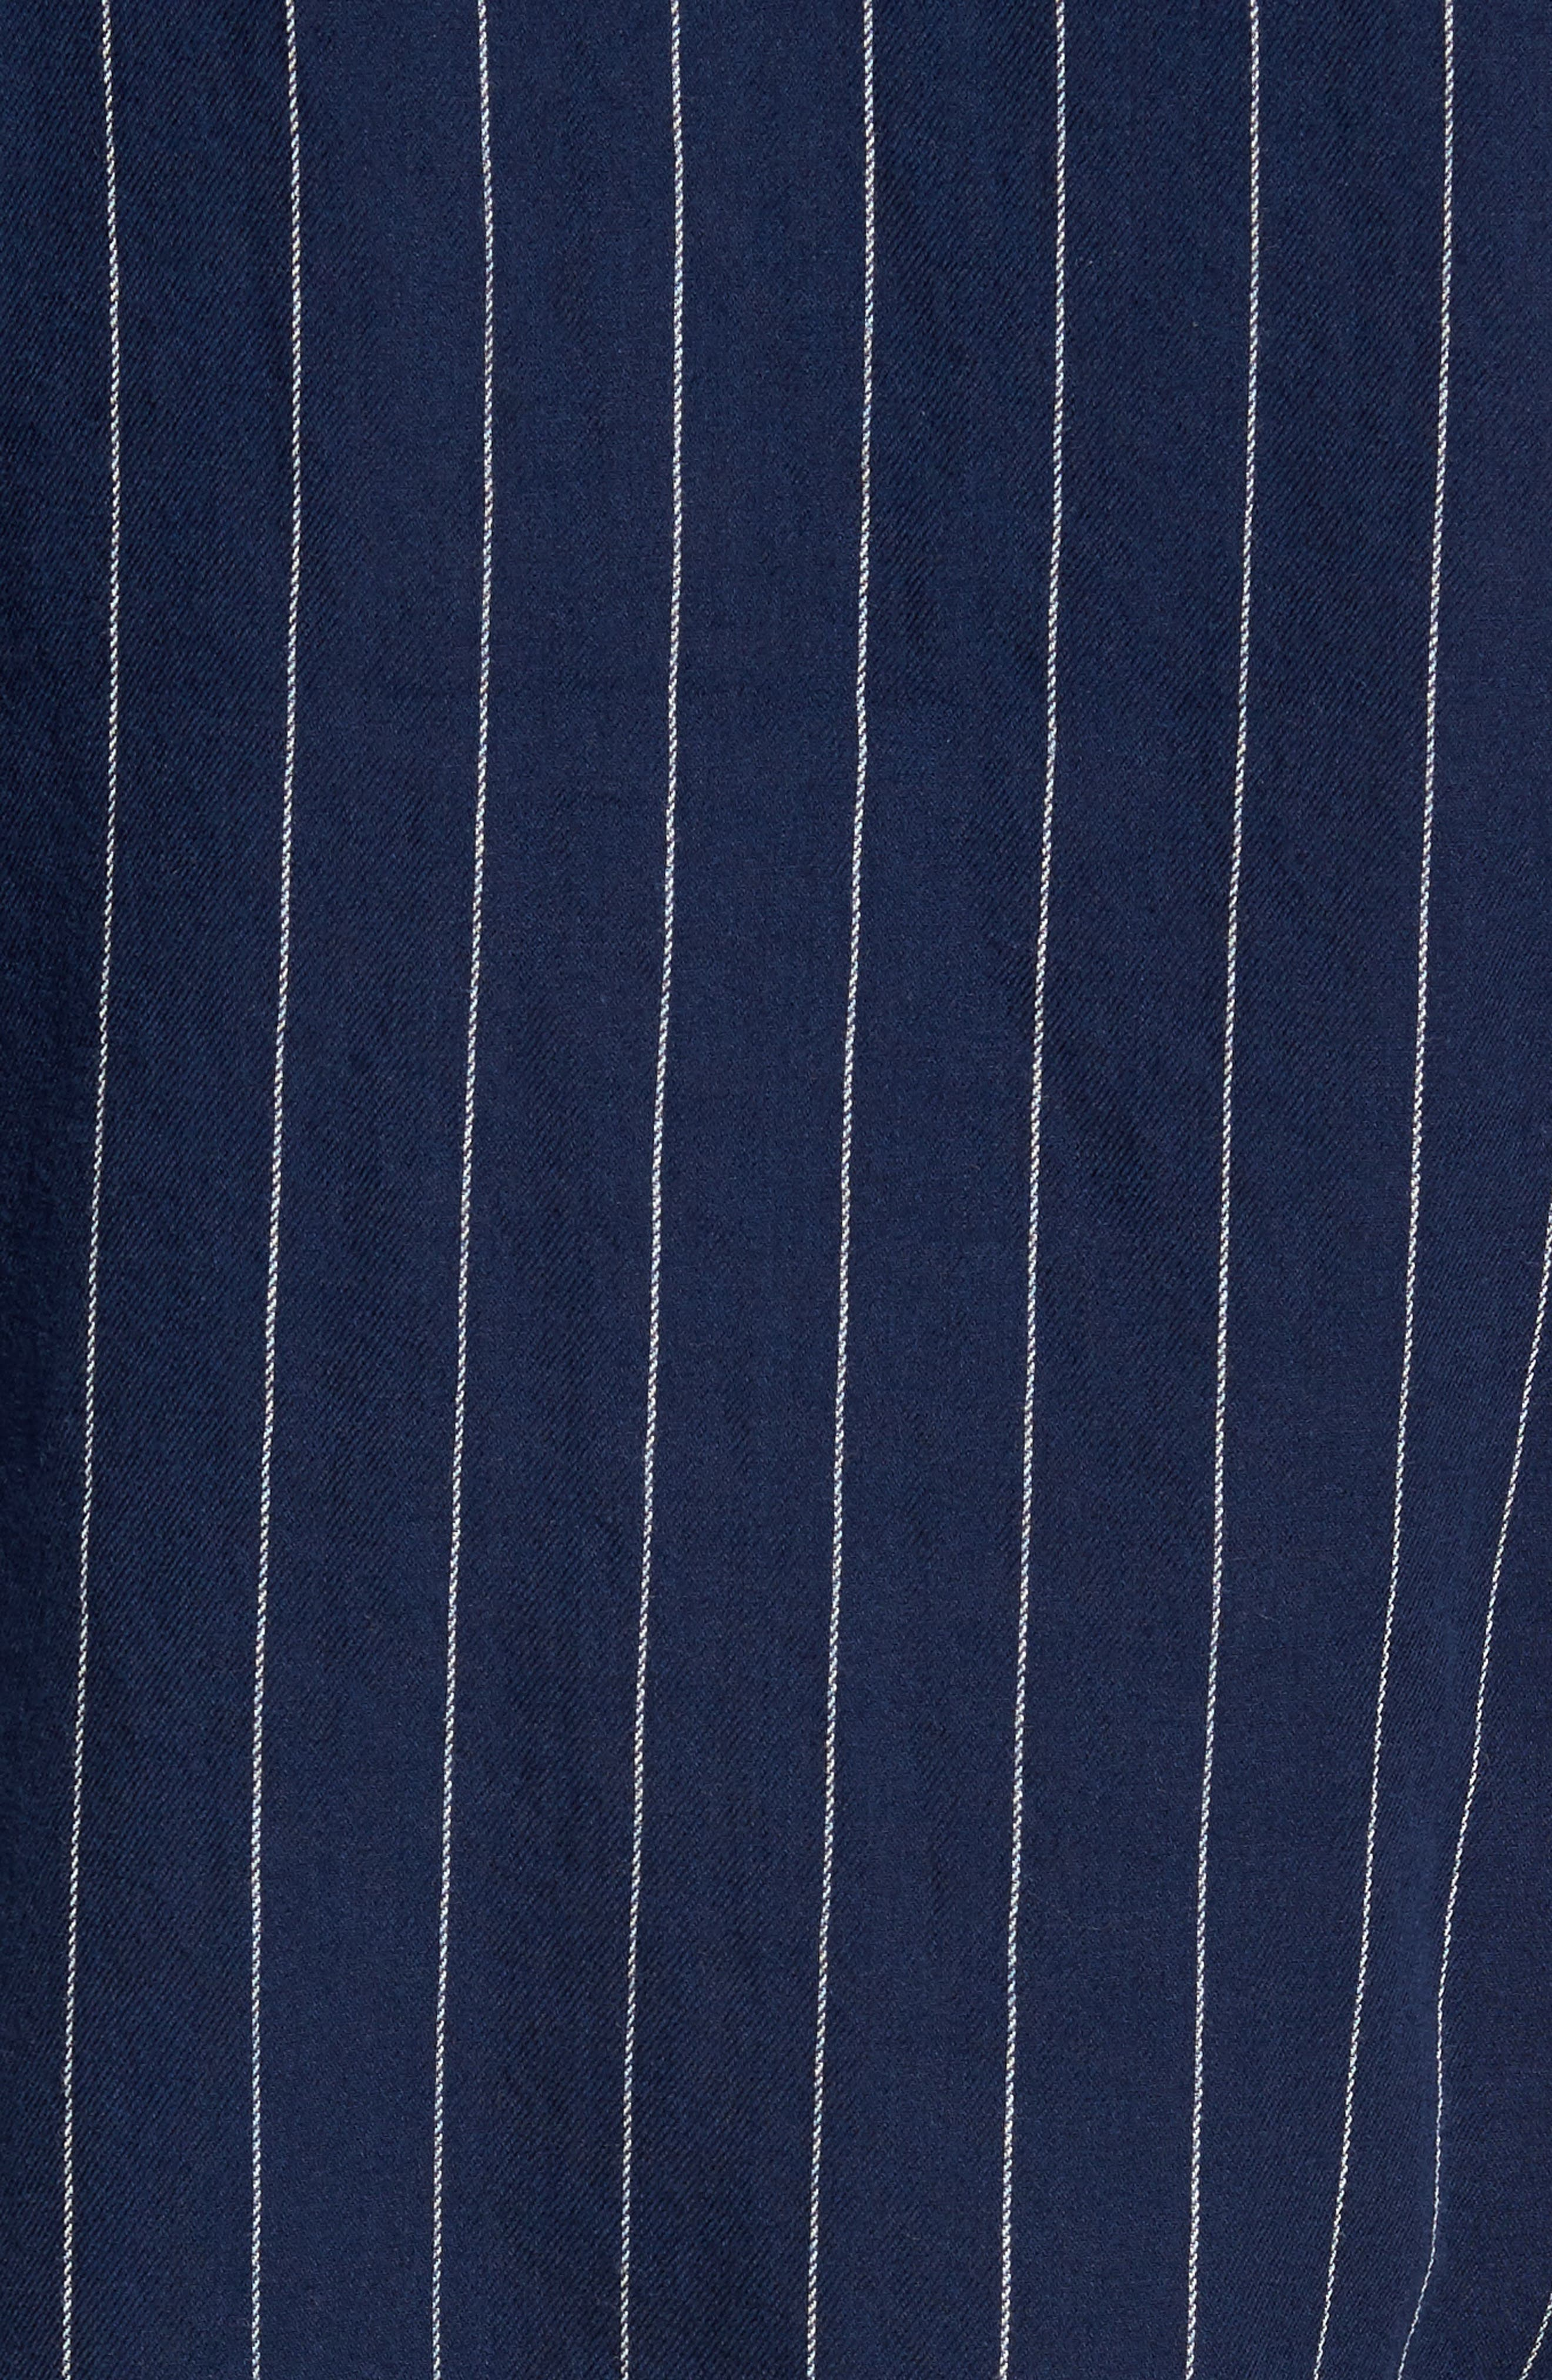 Stripe Twill Shirt,                             Alternate thumbnail 5, color,                             410